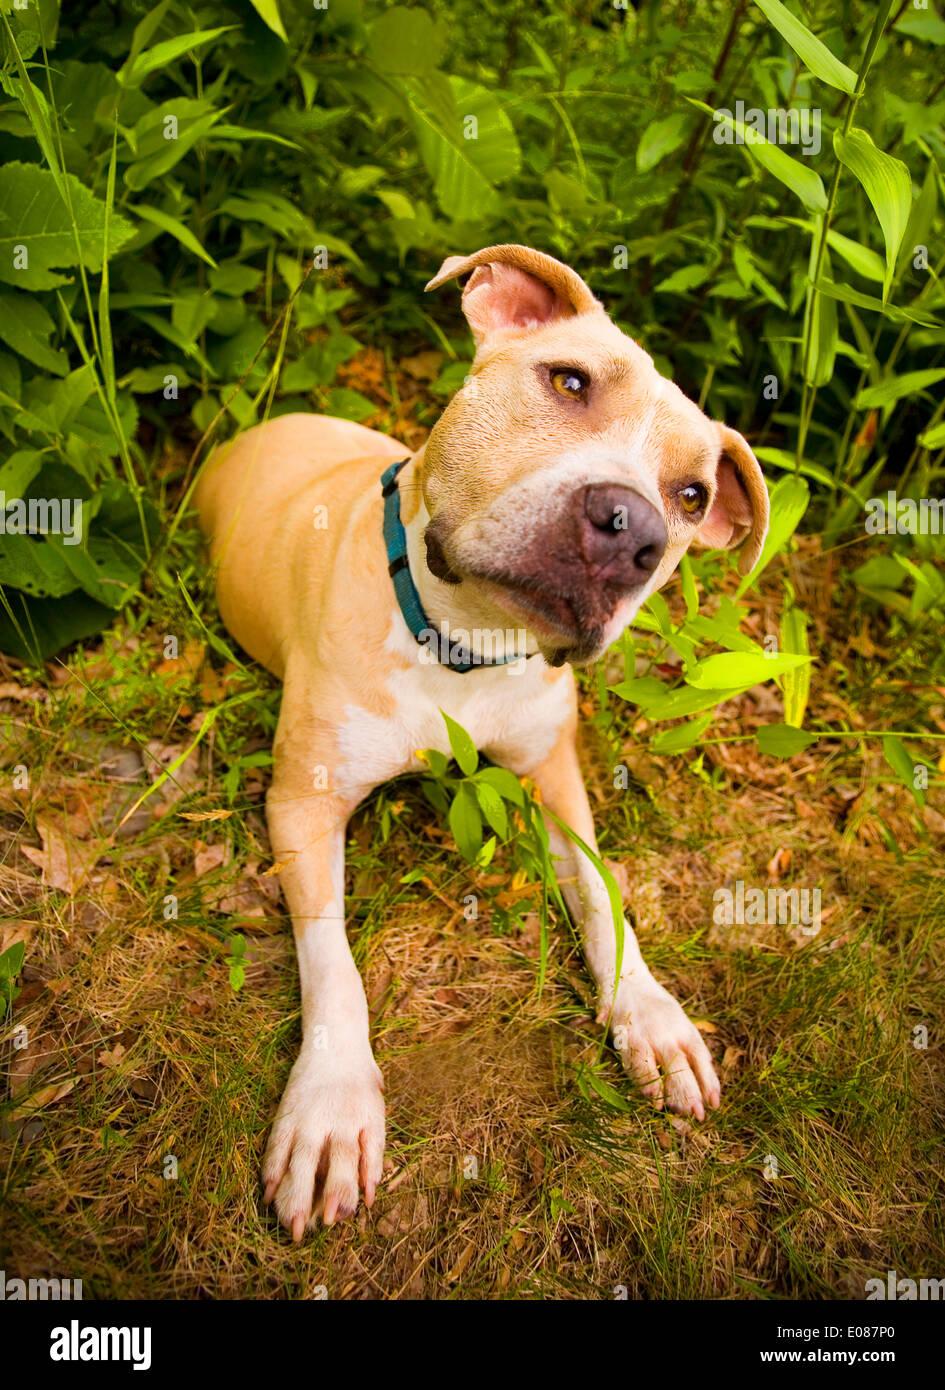 Pitbull Puppy Stock Photos & Pitbull Puppy Stock Images - Alamy